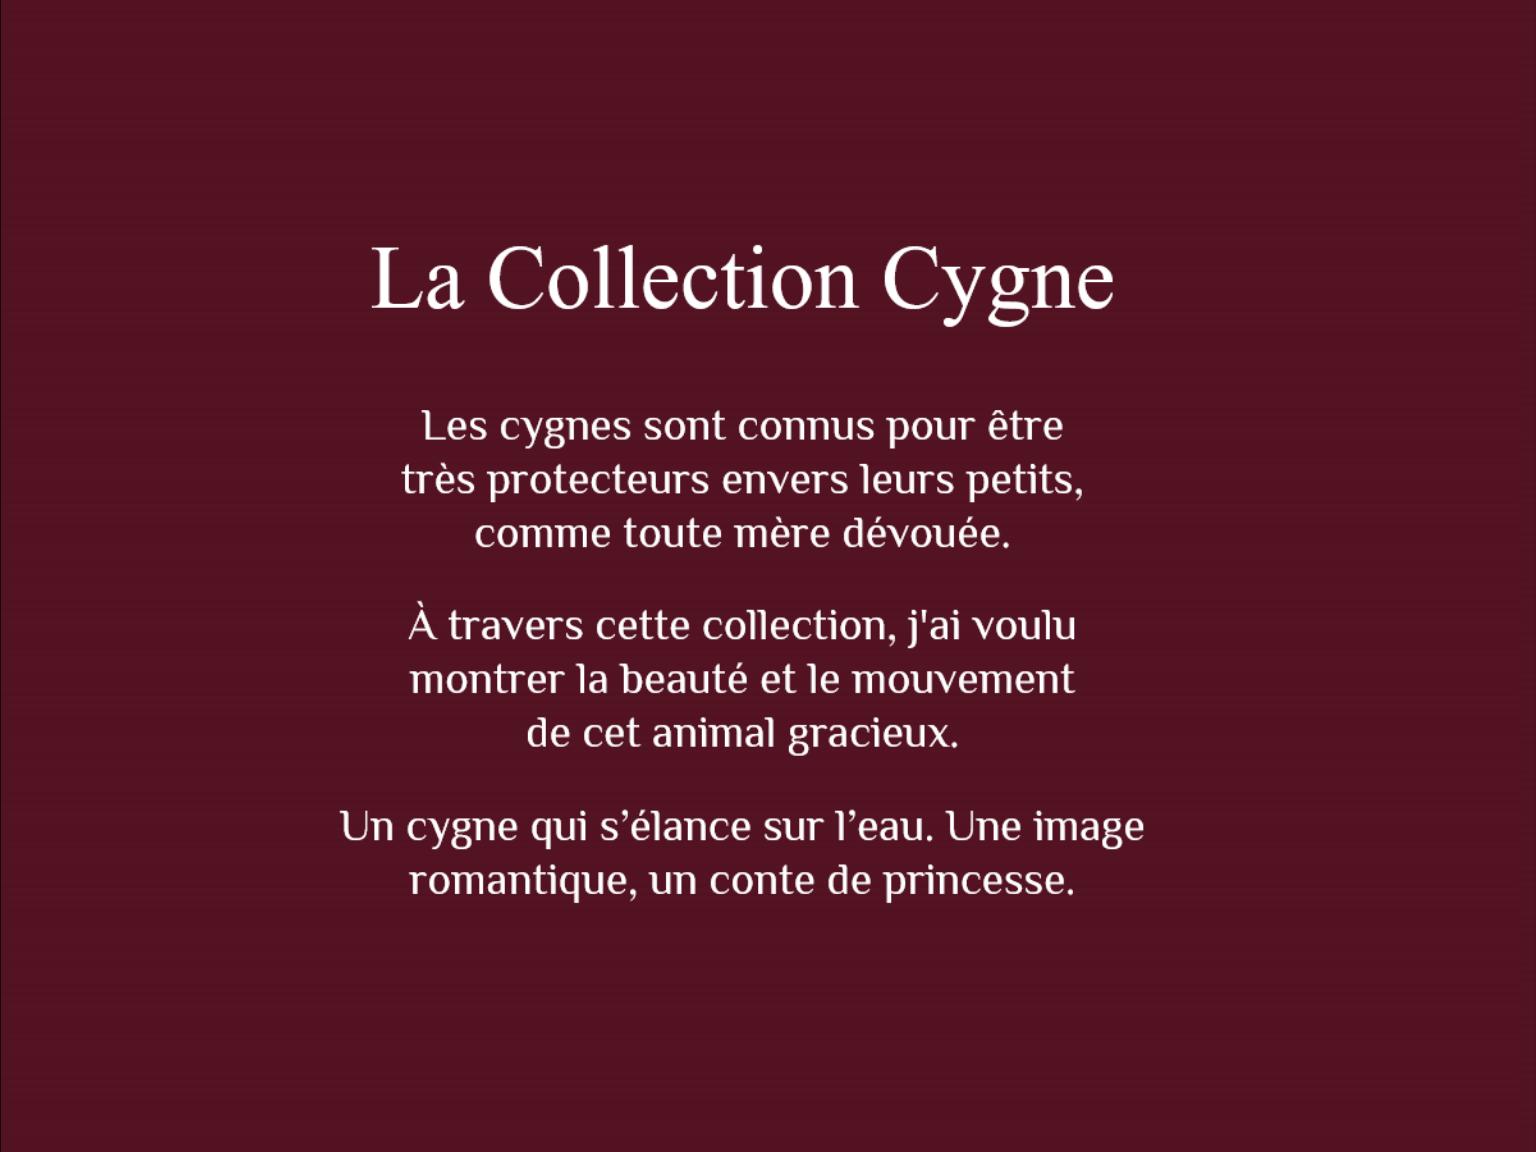 La collection cygne 15